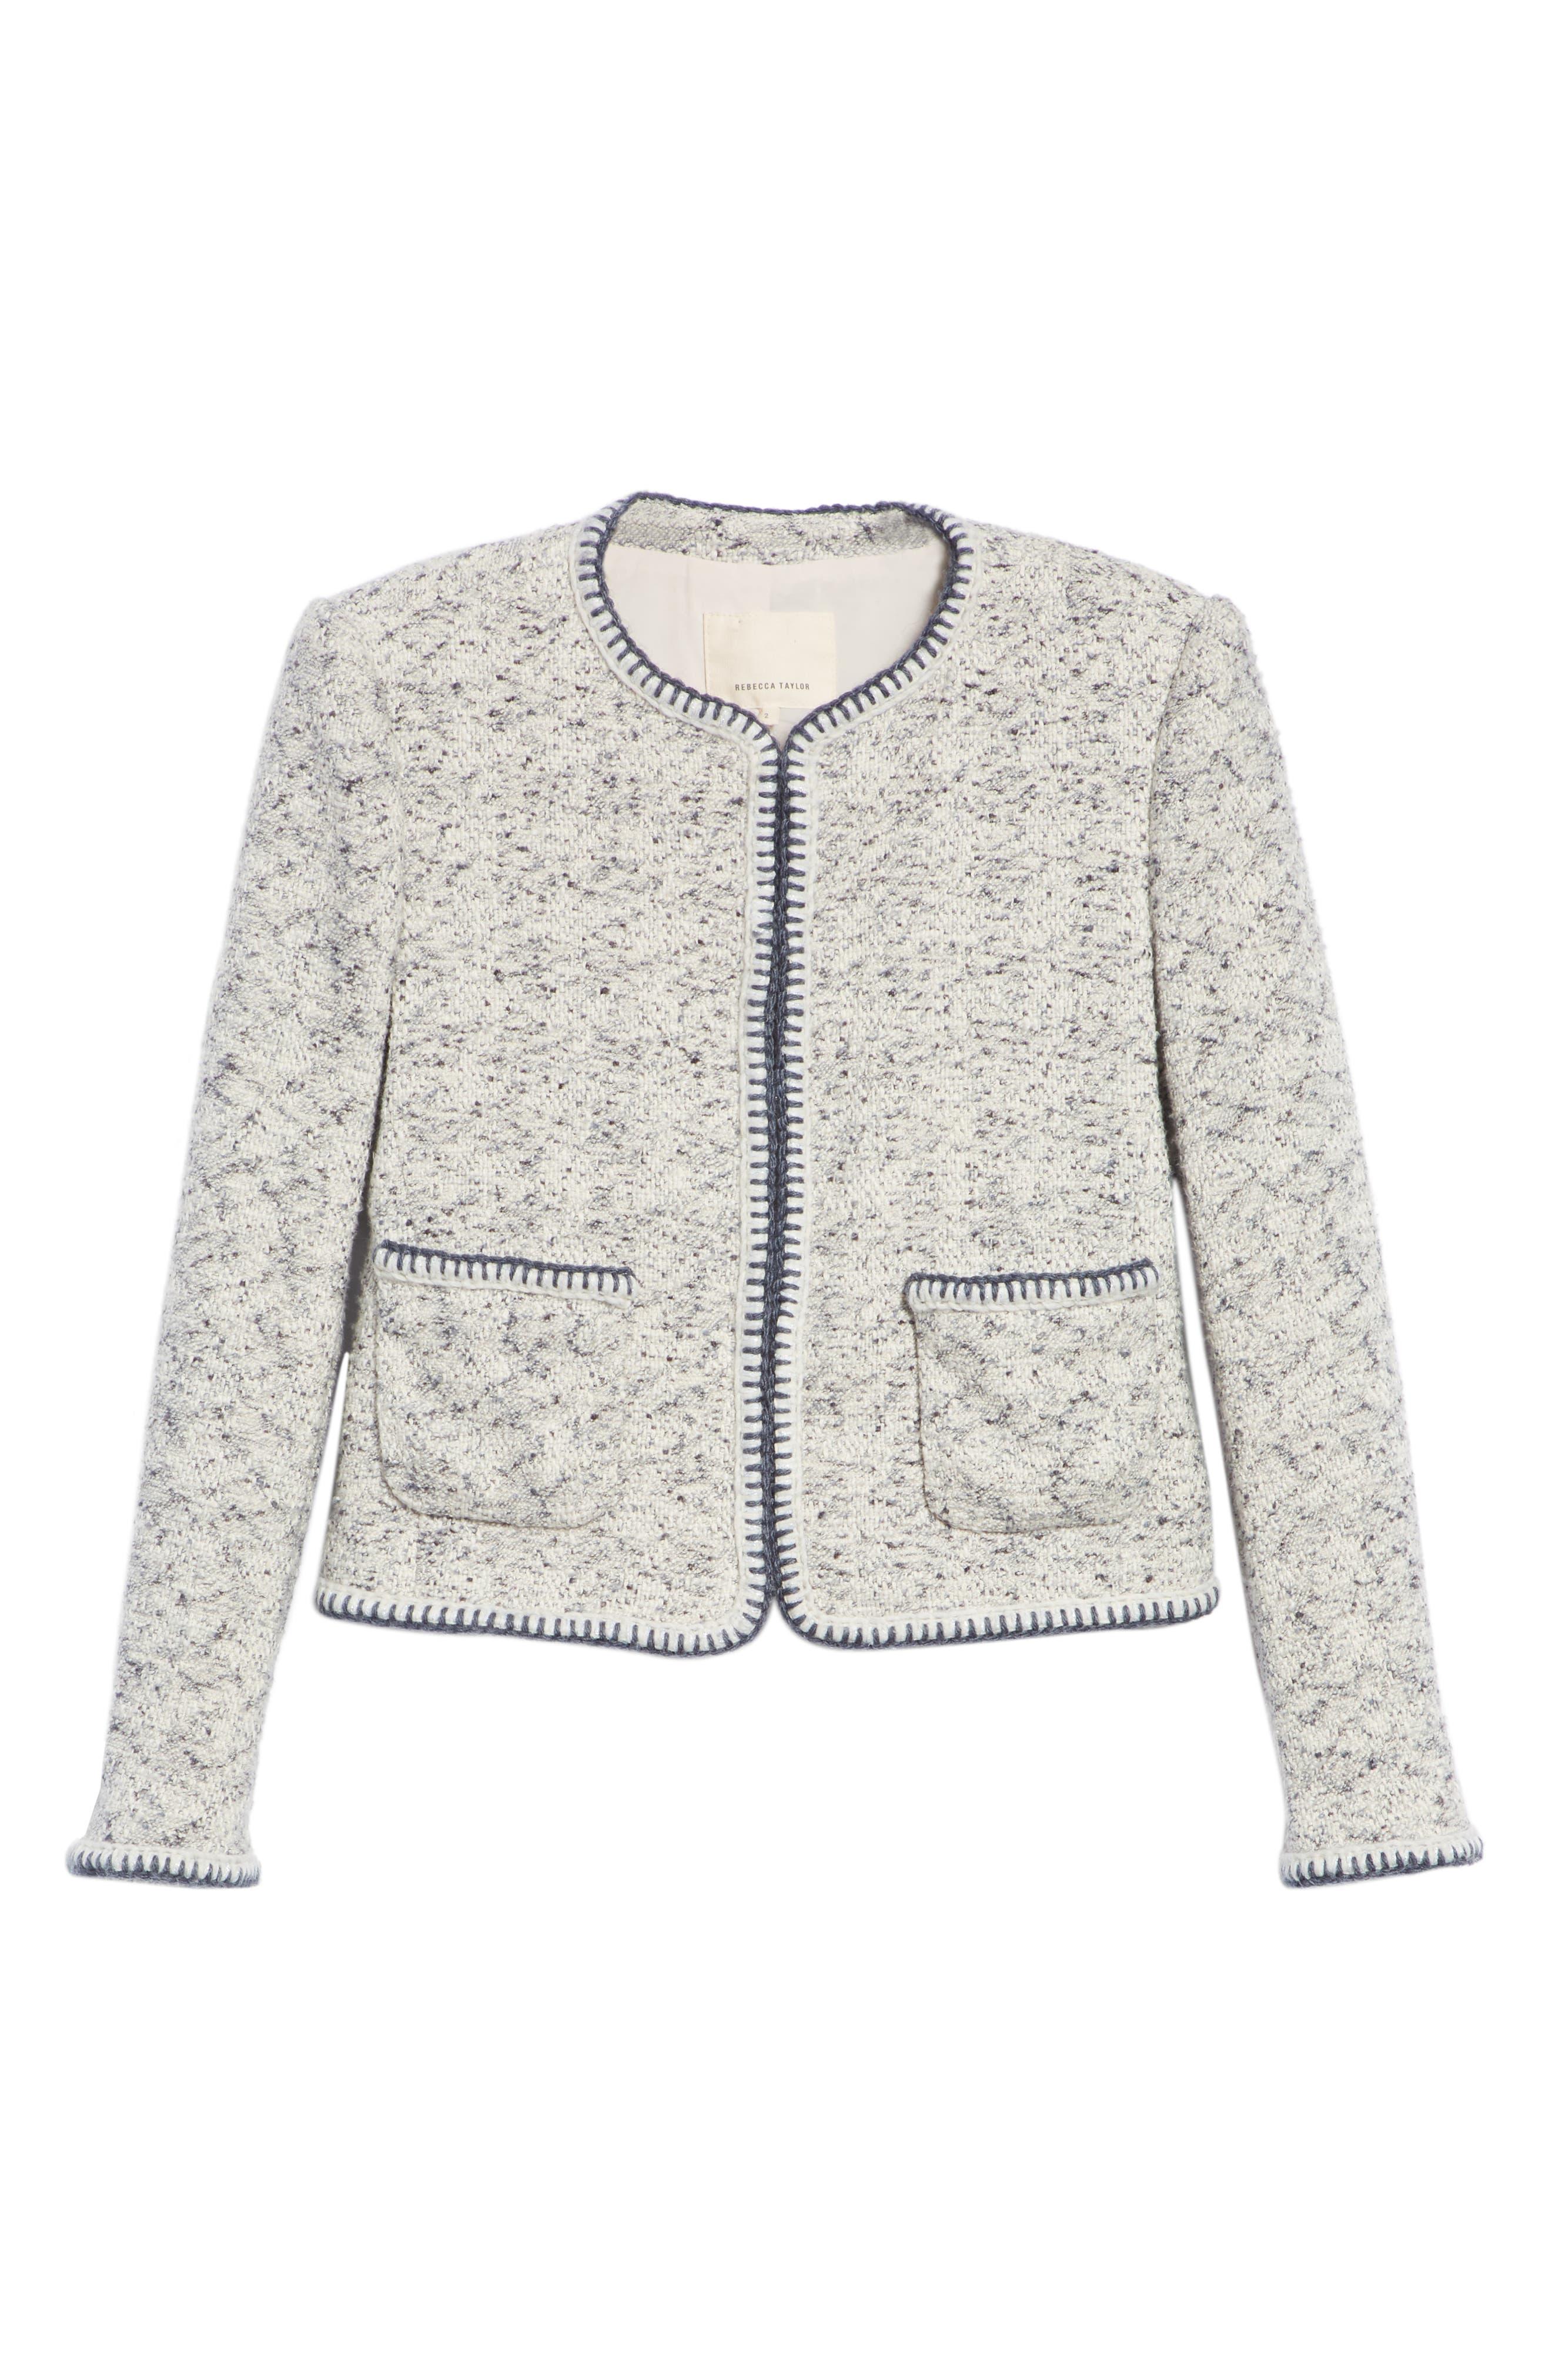 Speckled Tweed Jacket,                             Alternate thumbnail 5, color,                             054